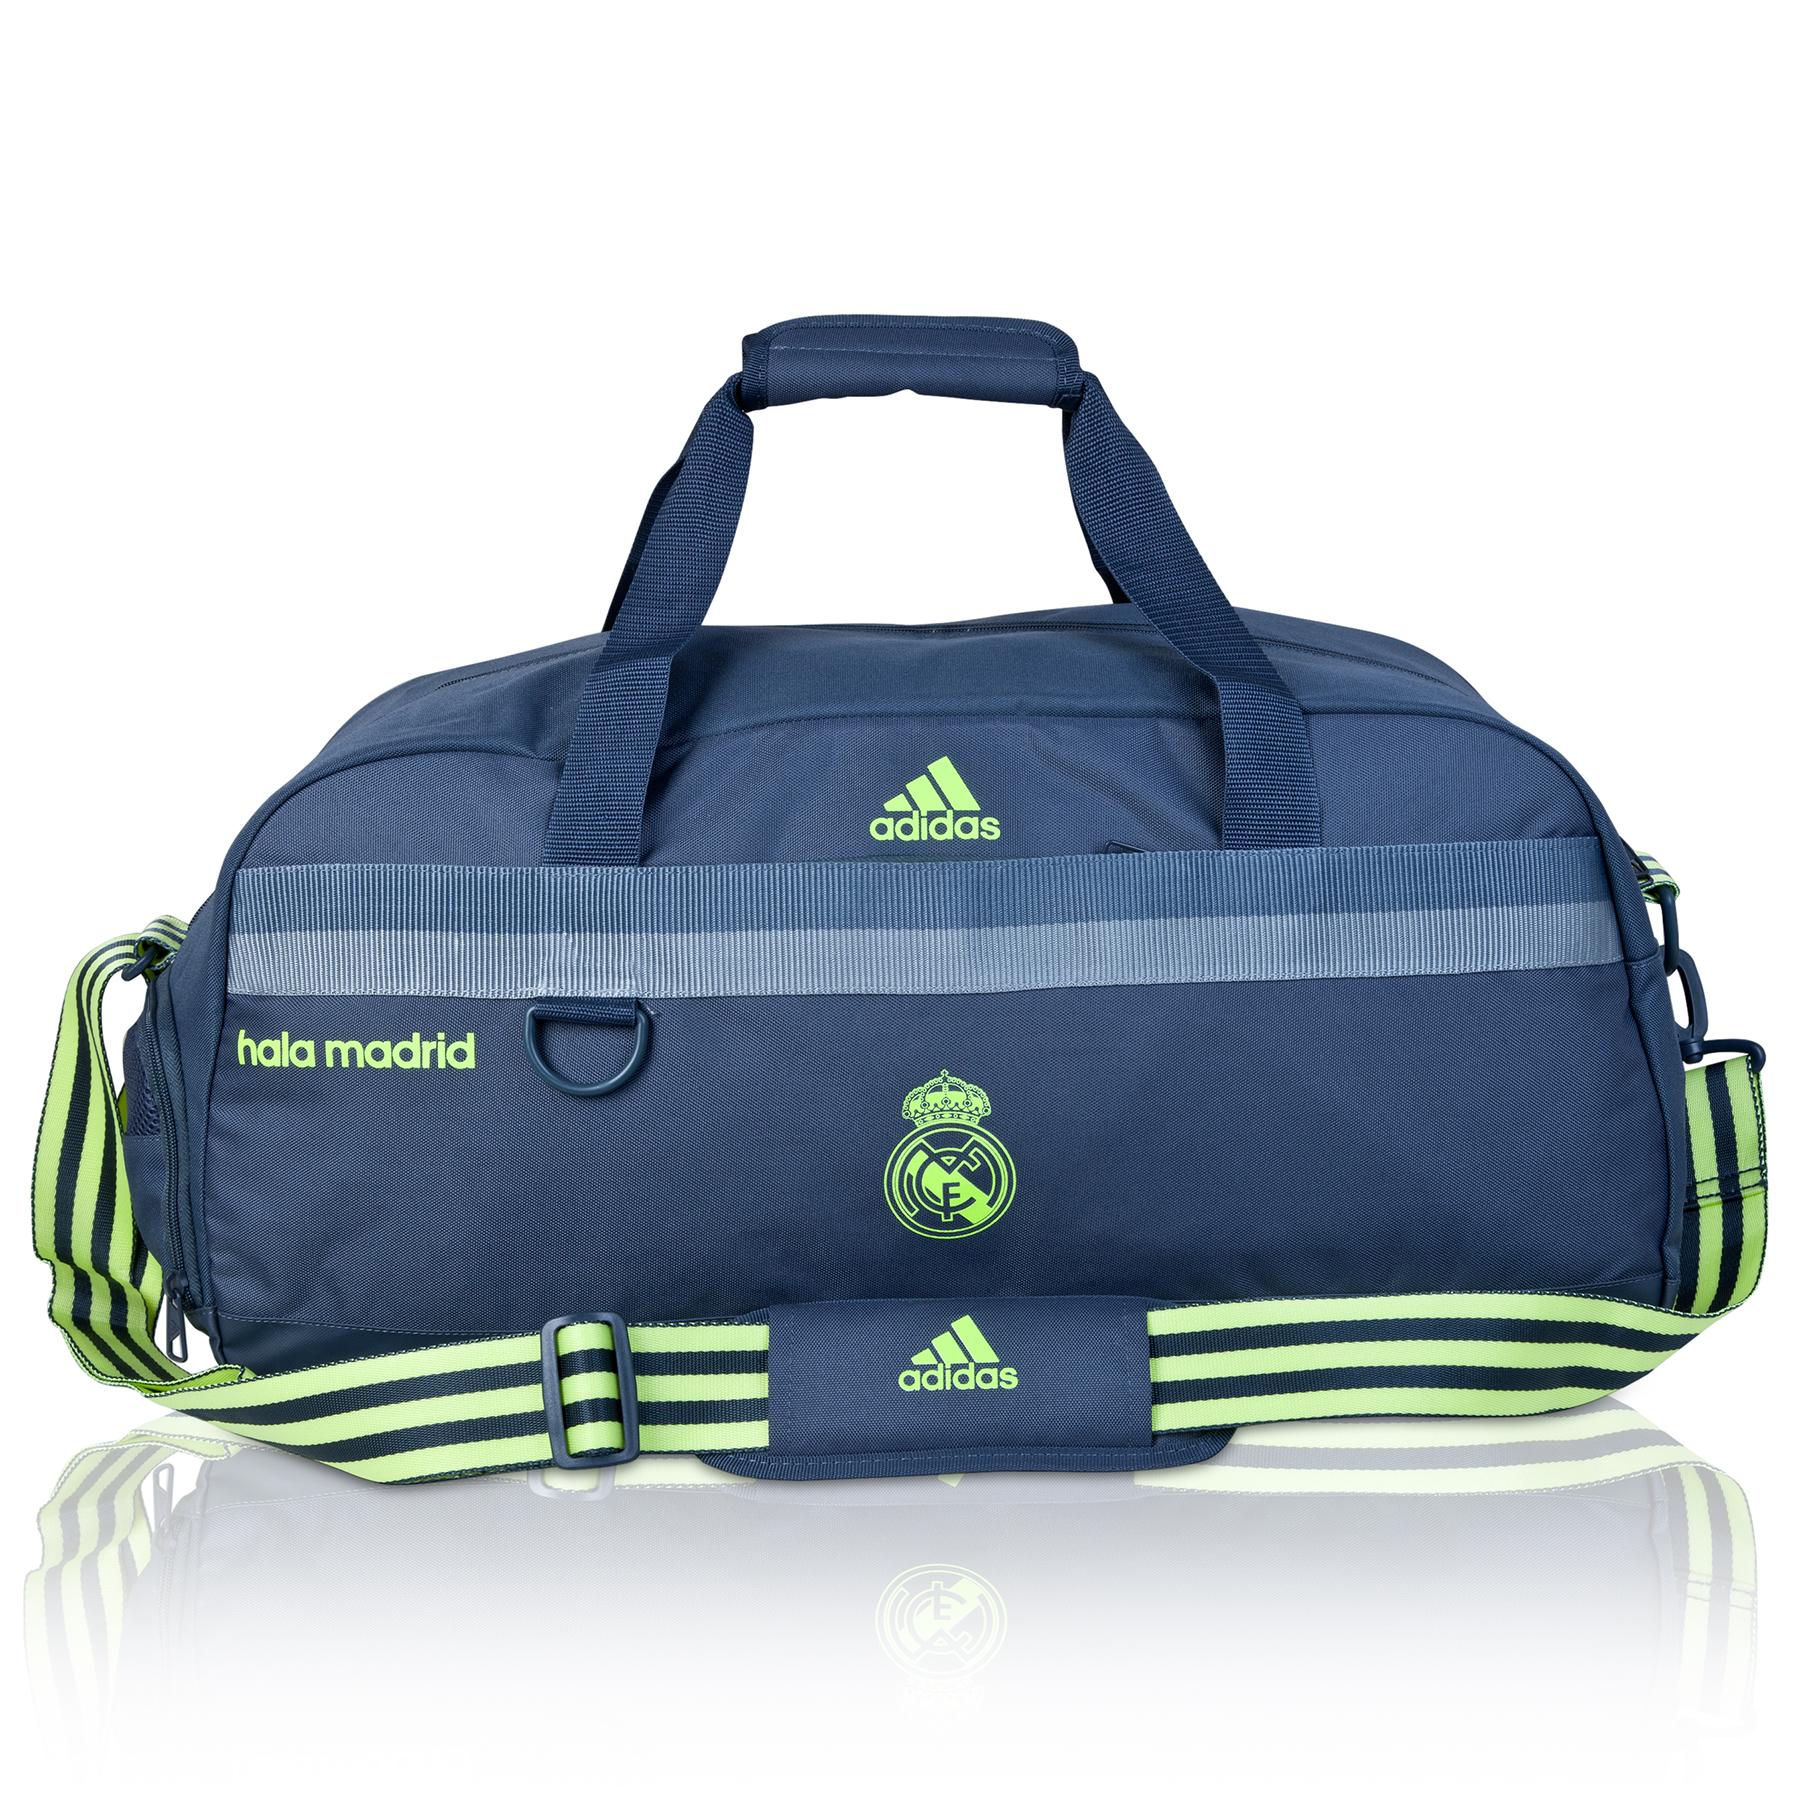 Mochila del equipo del Real Madrid - Negro